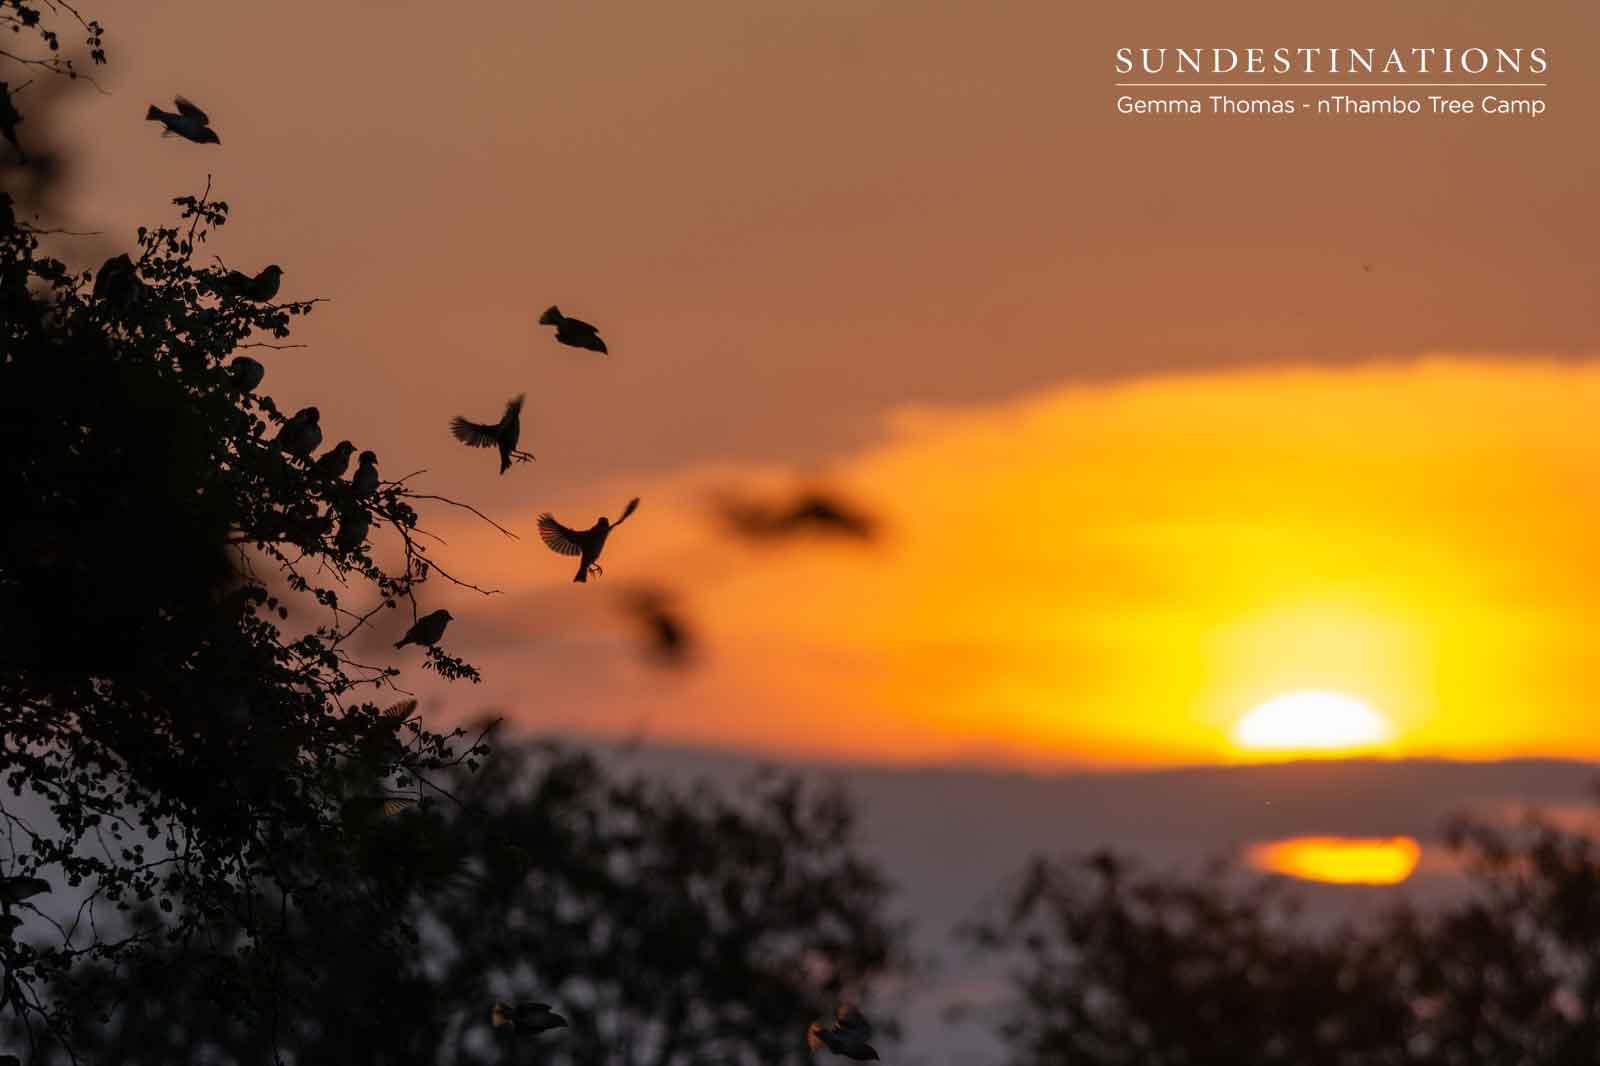 nThambo Birds at Sunset